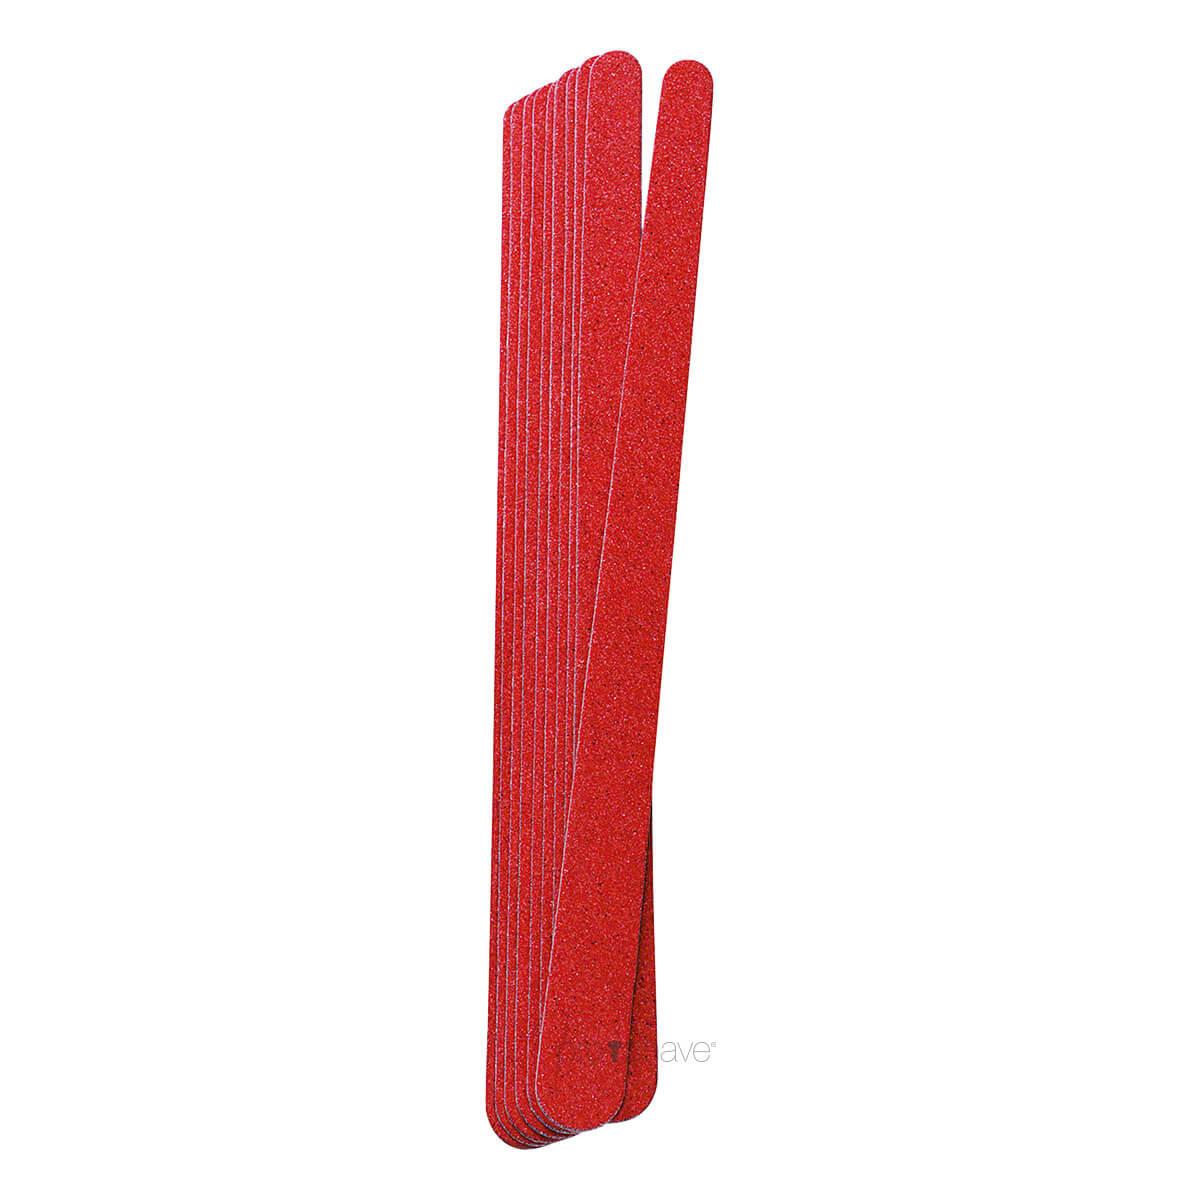 Zwilling Neglefil, Sandpapir - Emery Boards, 10 stk.